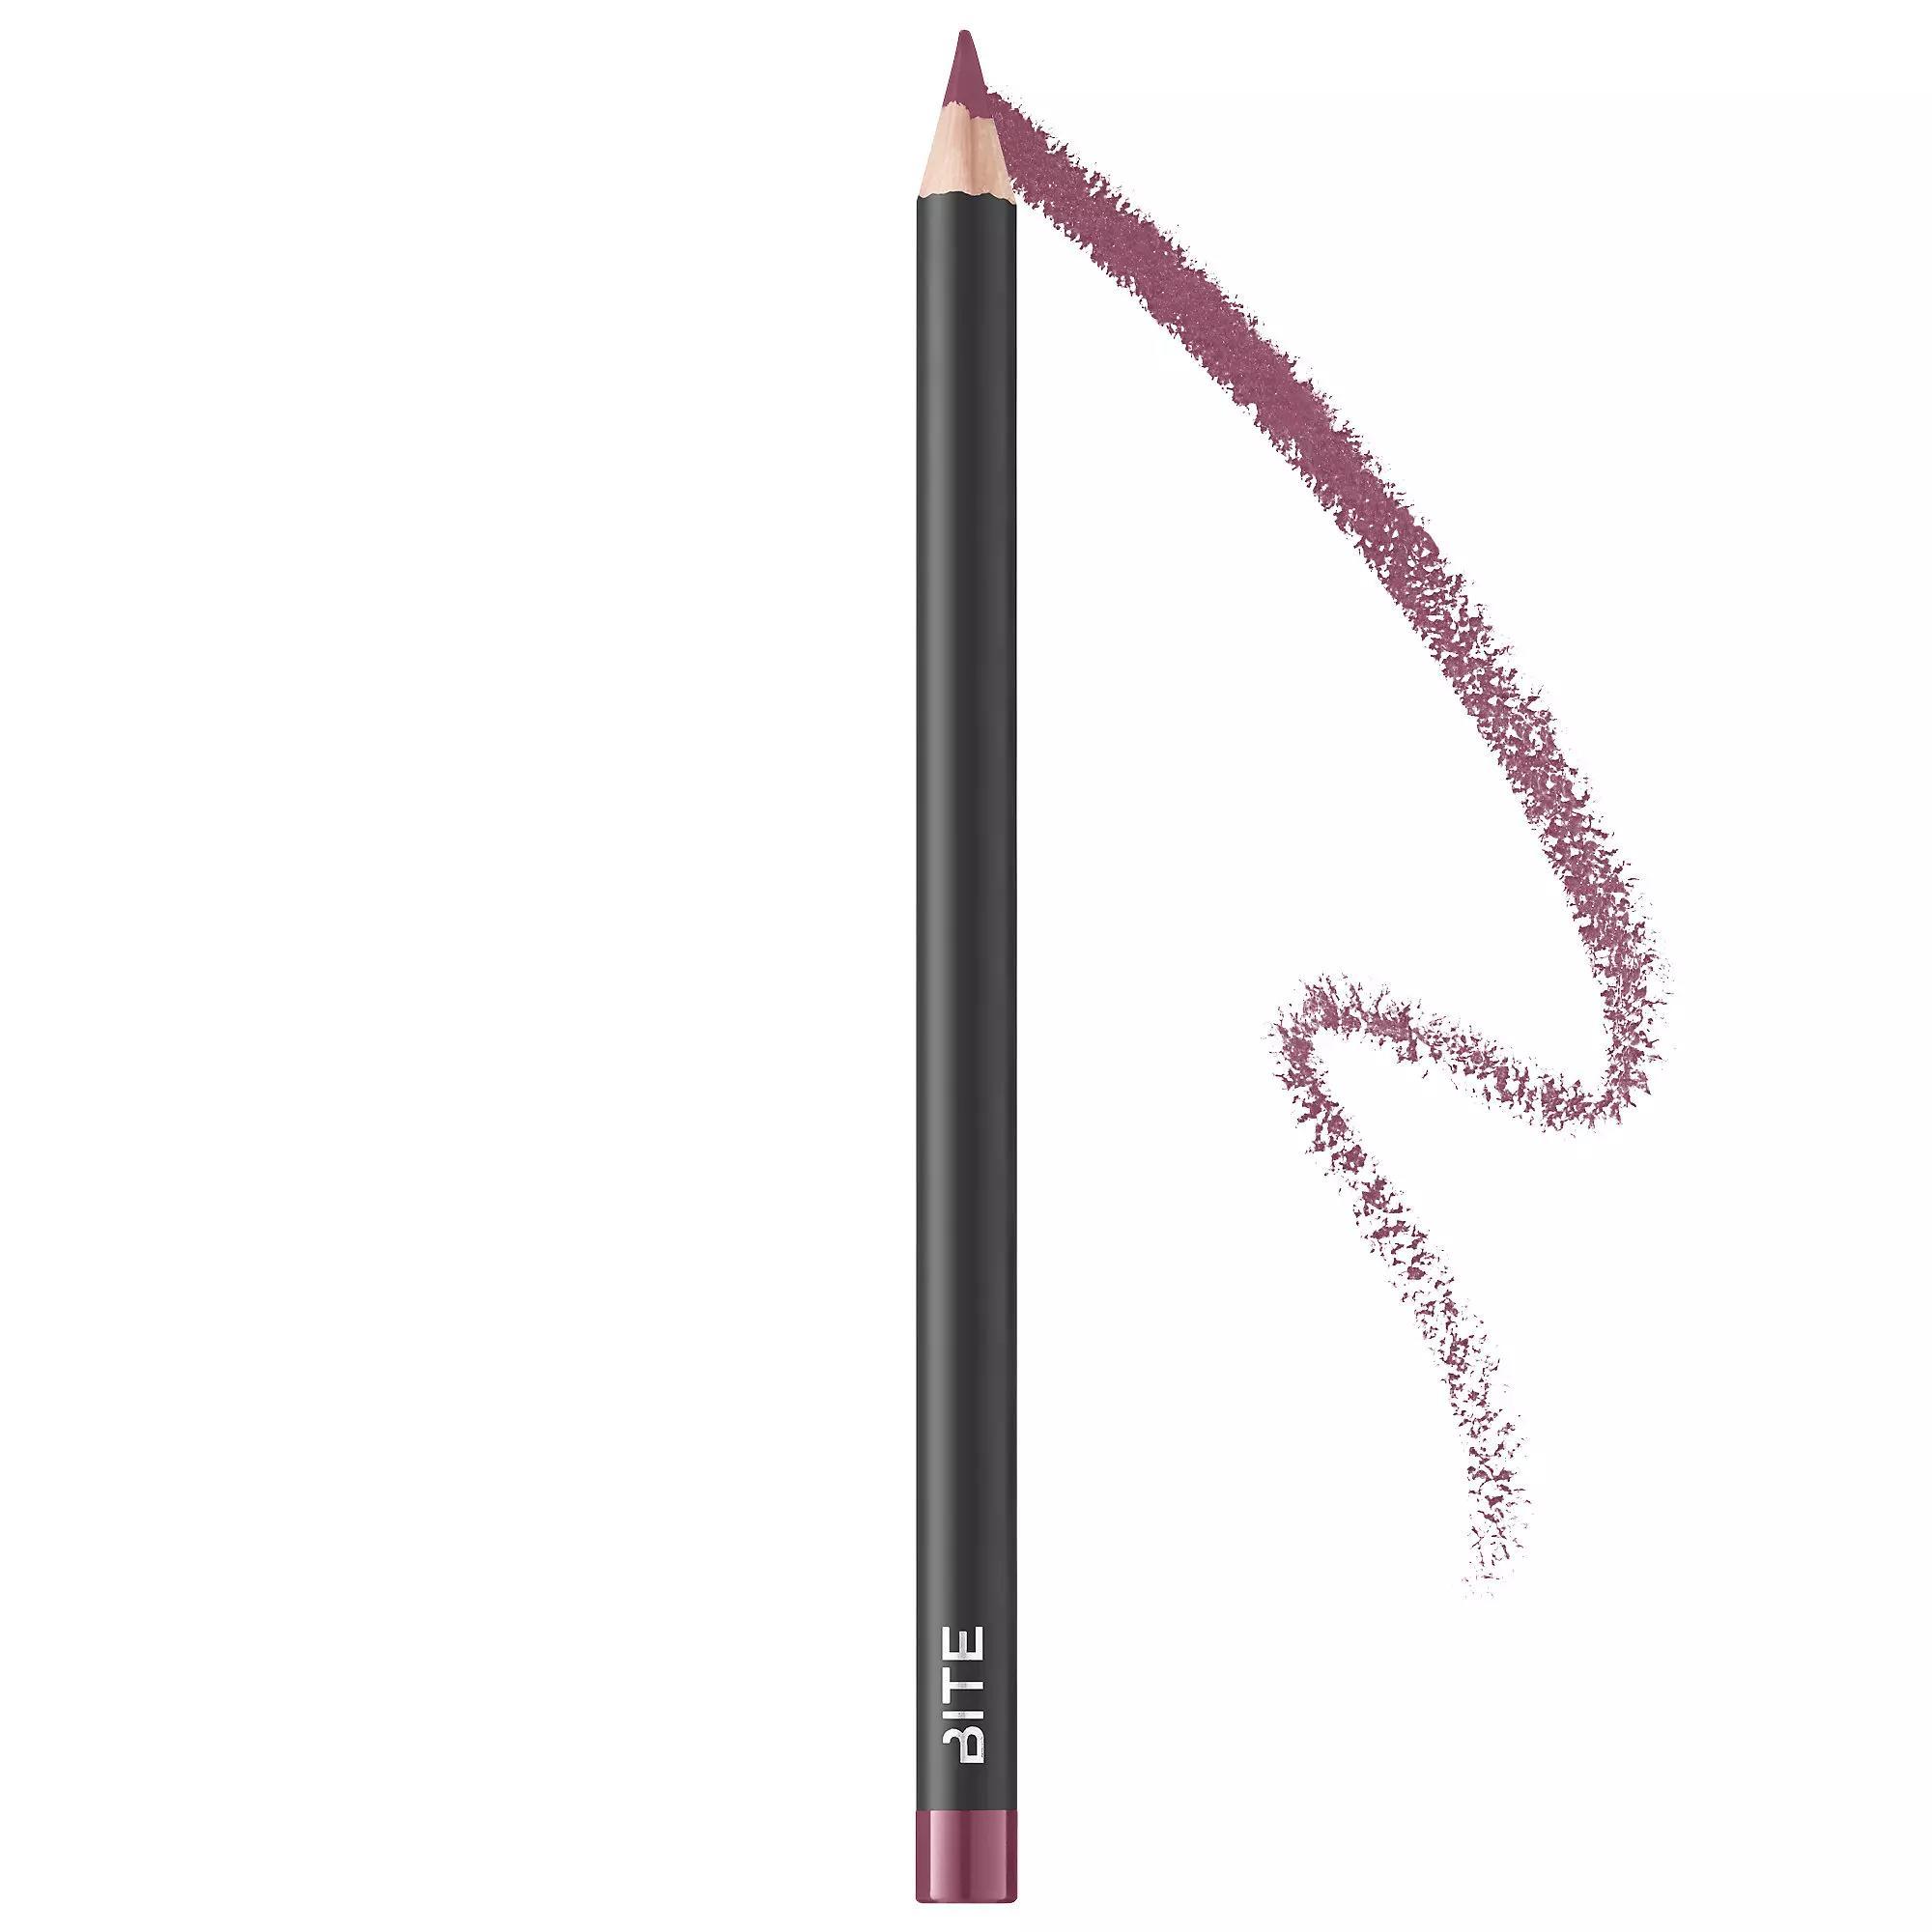 Bite Beauty The Lip Pencil 014 Mini